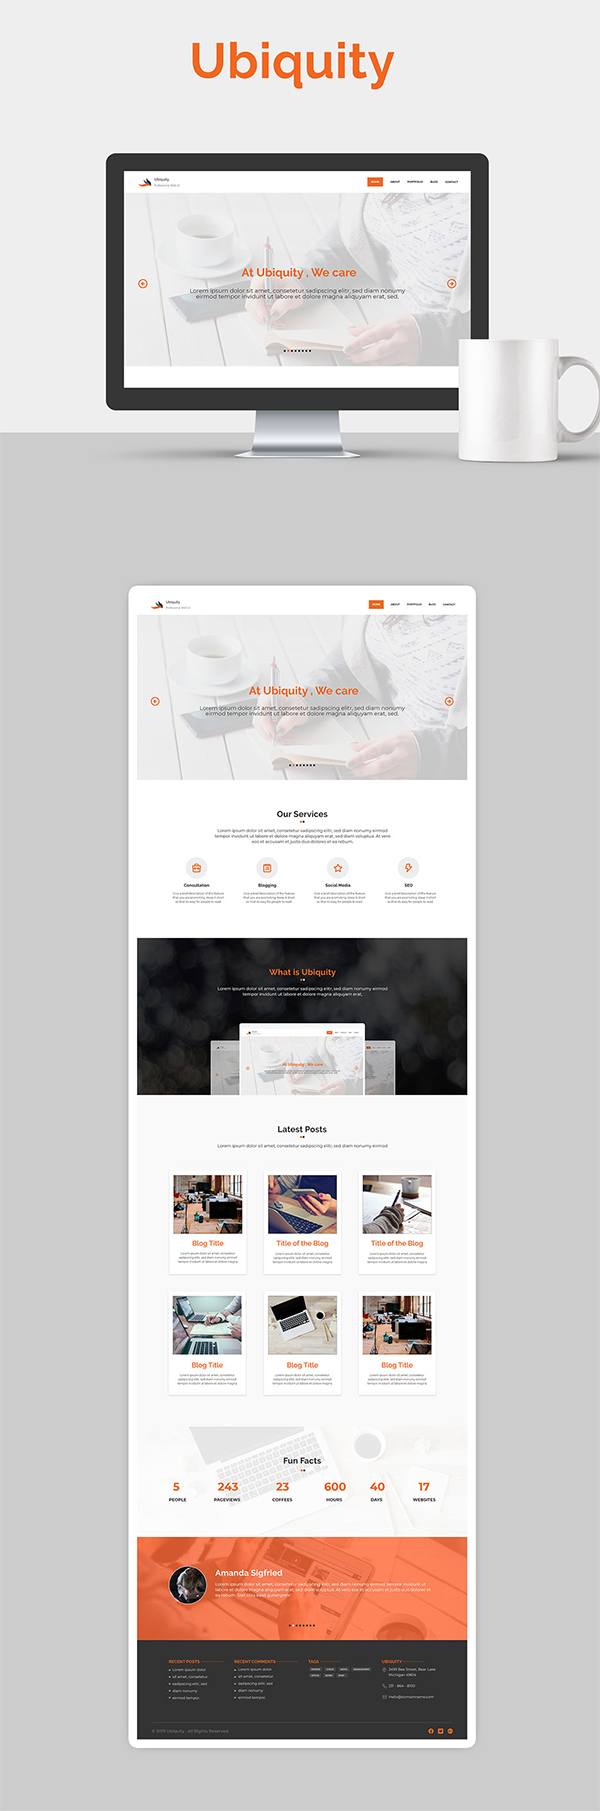 50 Useful Free Psd Files 2020 Gillde Design Inspiration